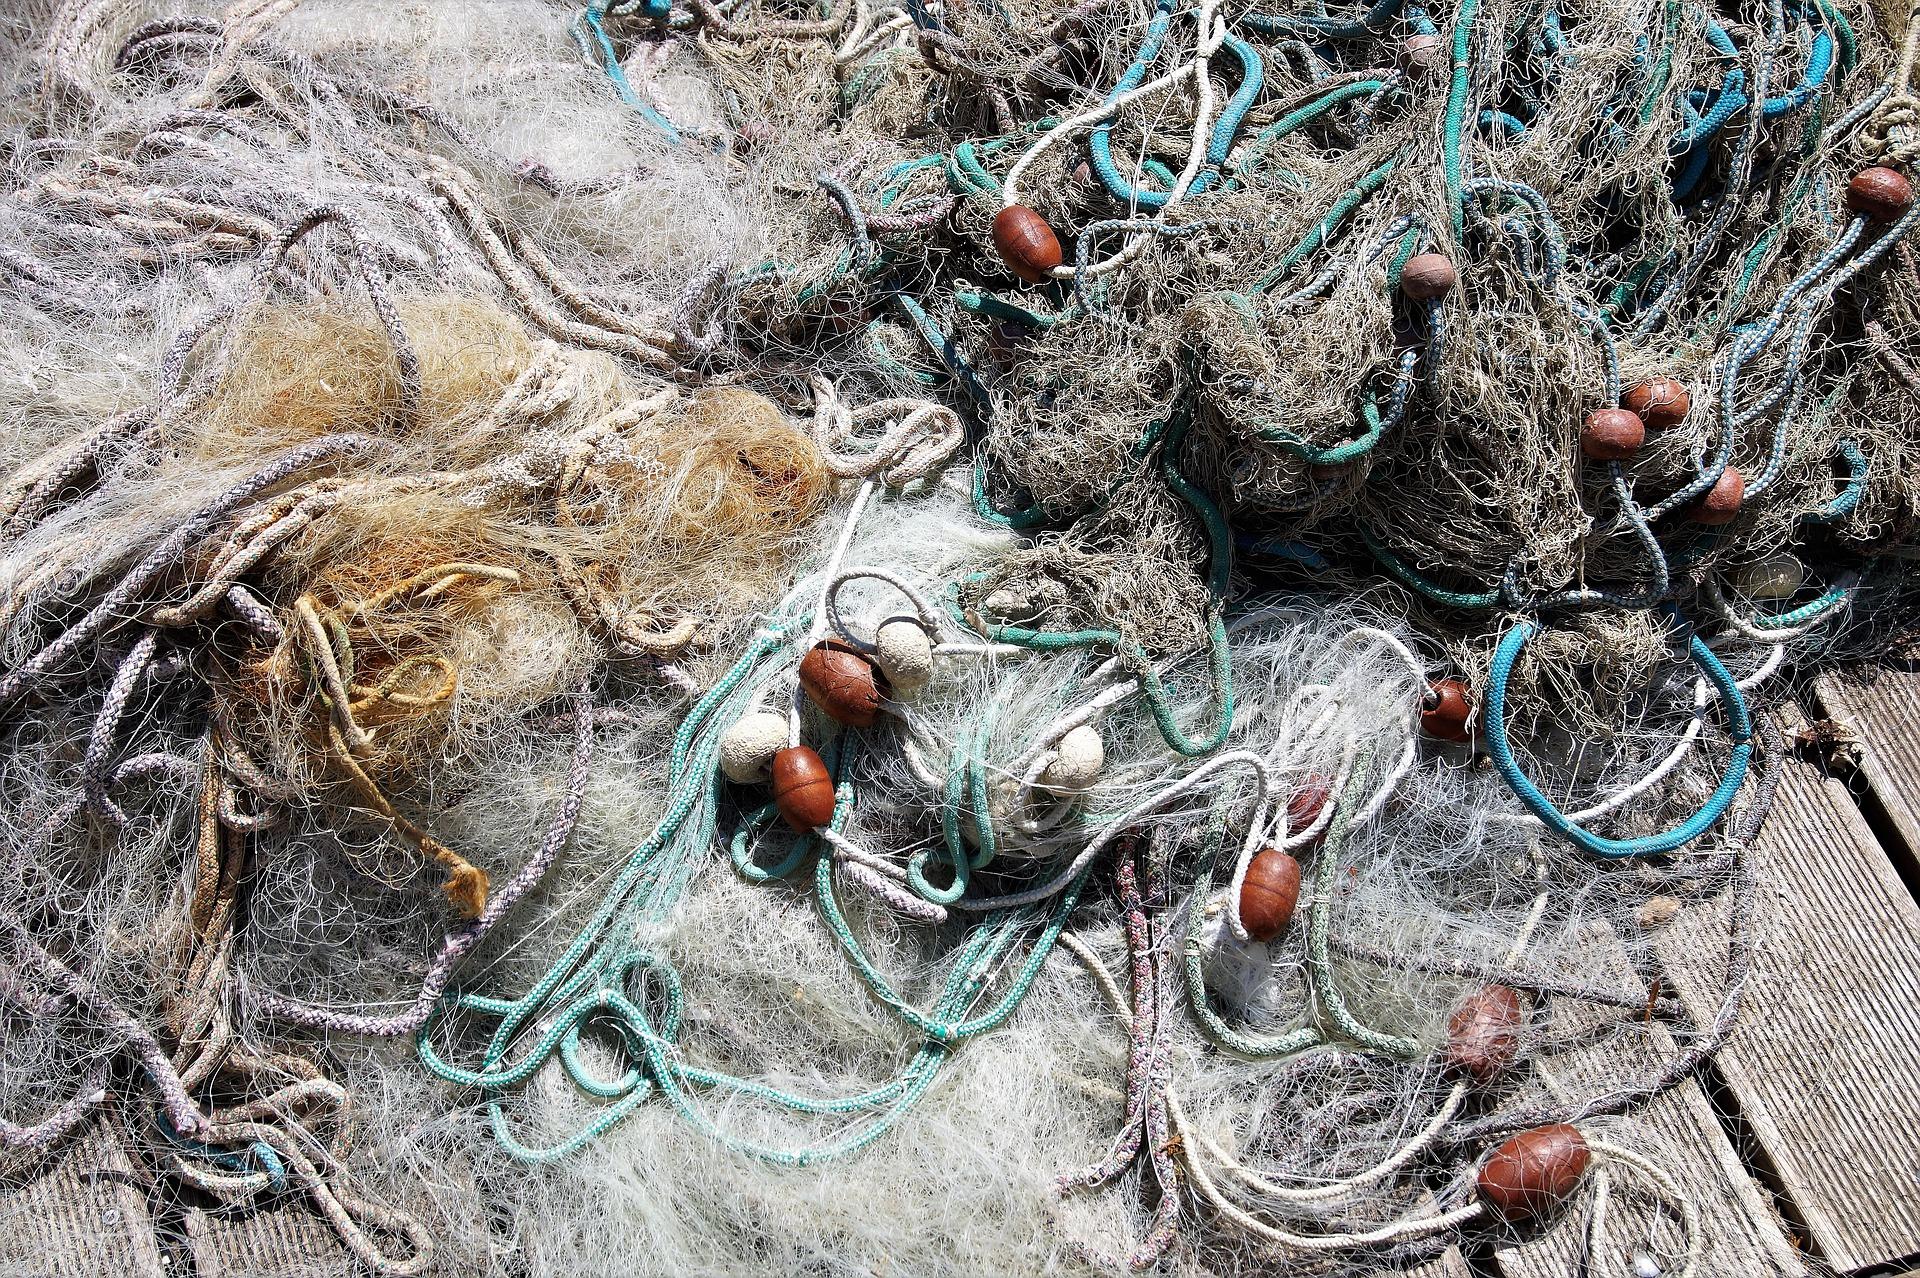 fishing-net-2571564_1920.jpg